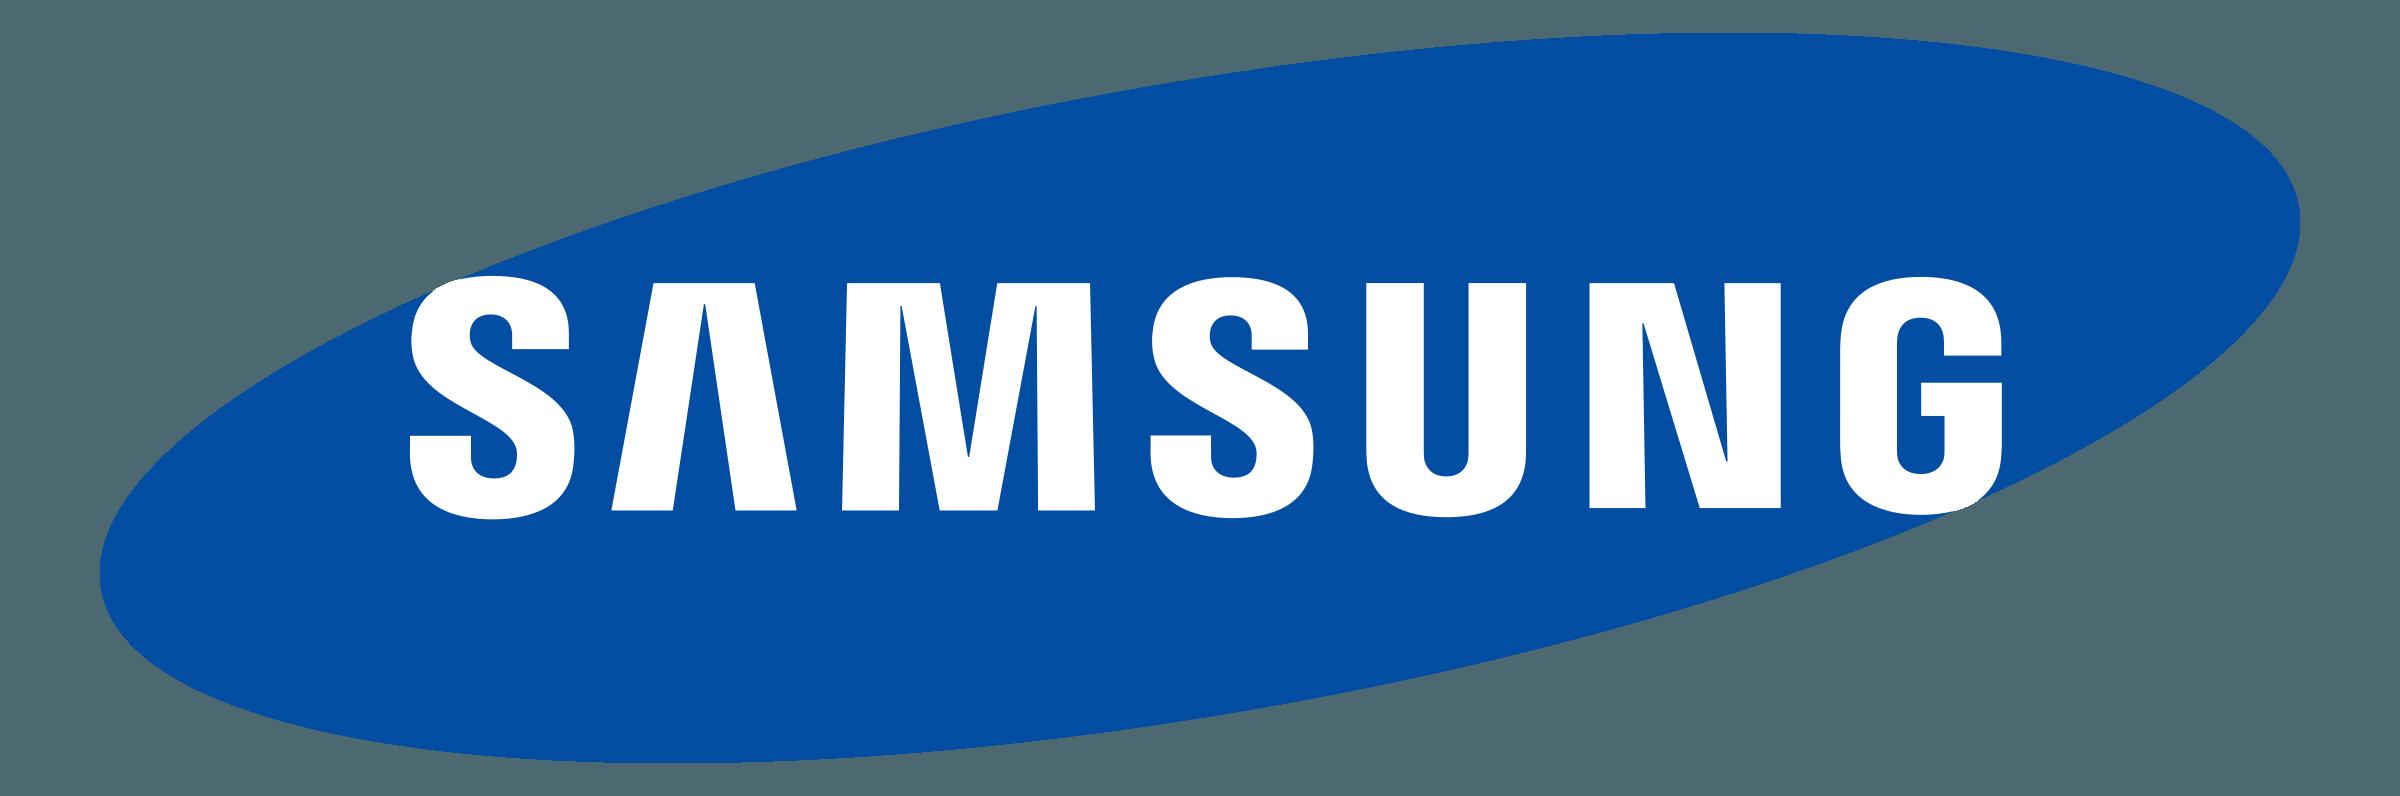 https://www.repairbros.com/wp-content/uploads/2019/12/samsung-logo-transparent.png